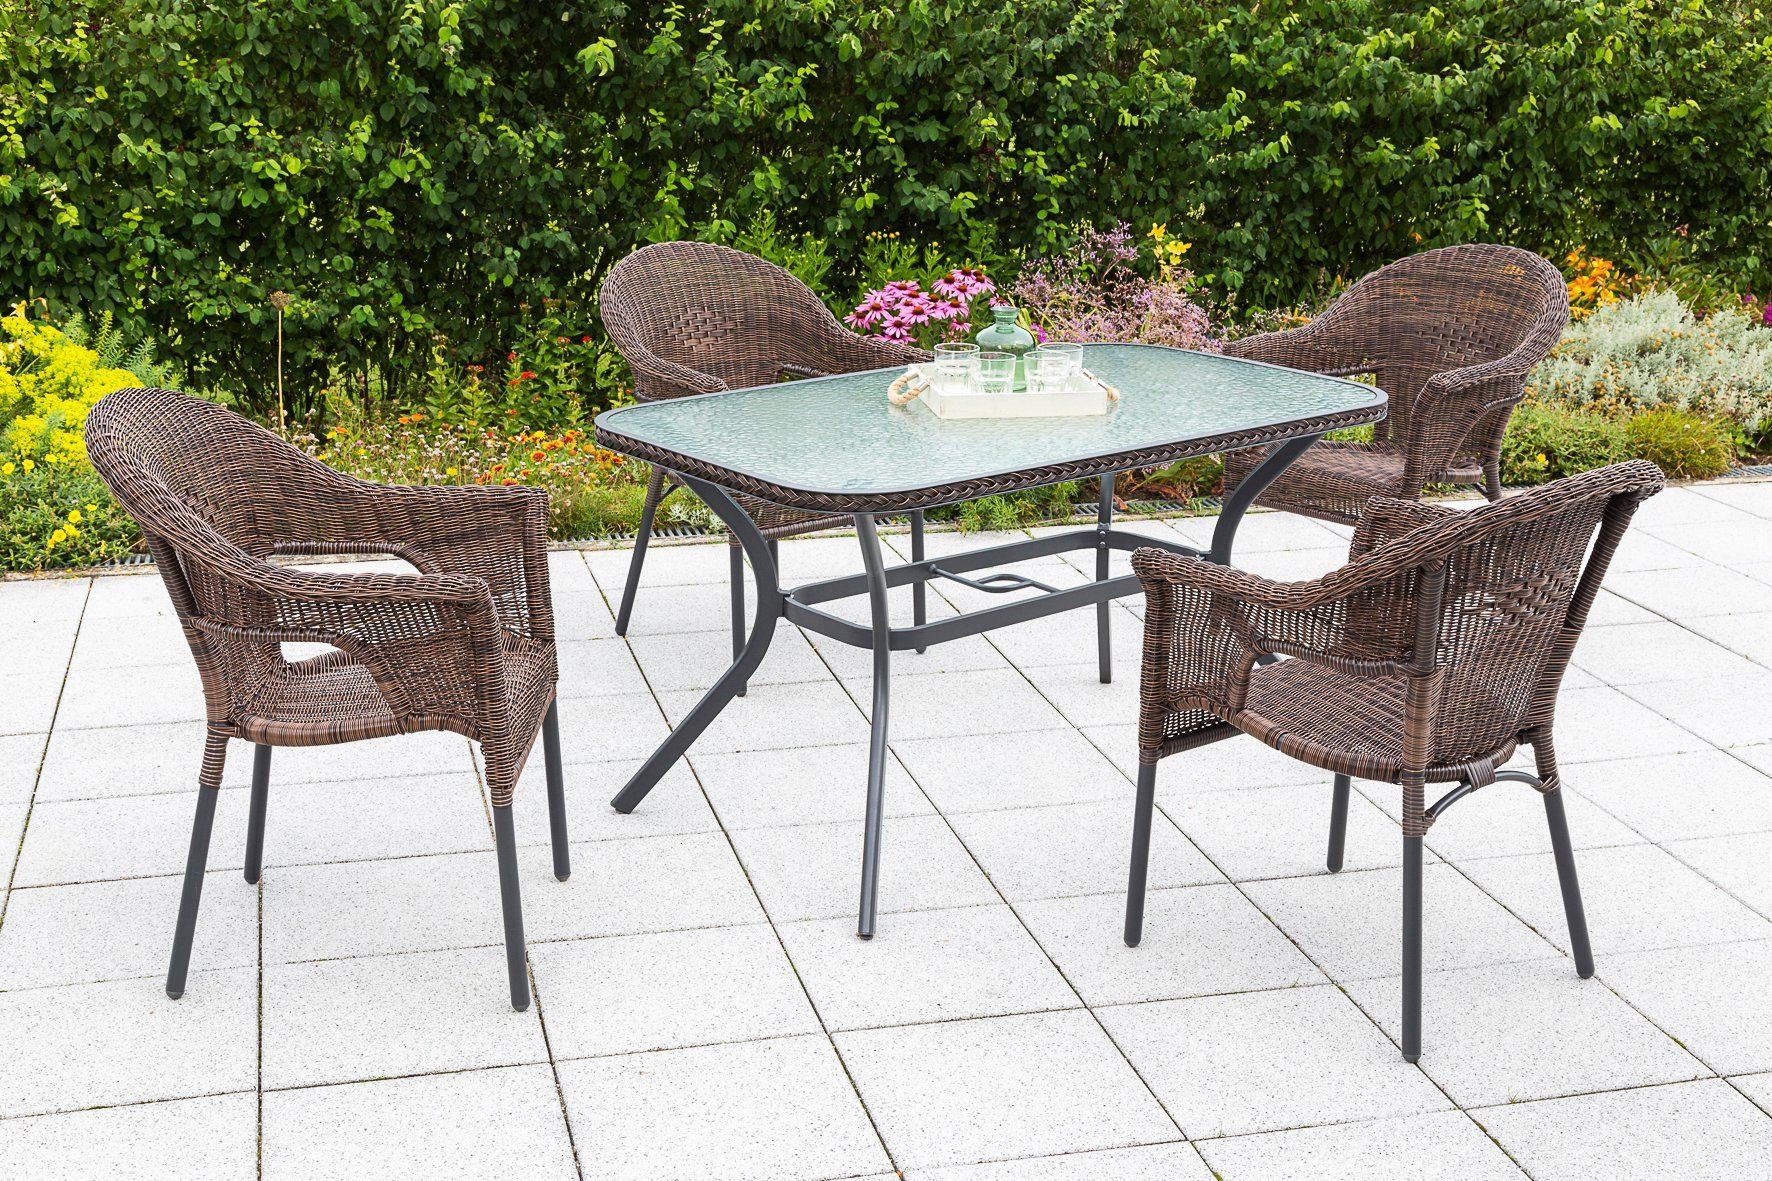 MERXX Gartenmöbelset »Ravenna«, 5tlg., 4 Sessel, Tisch, stapelbar, Polyrattan, braun